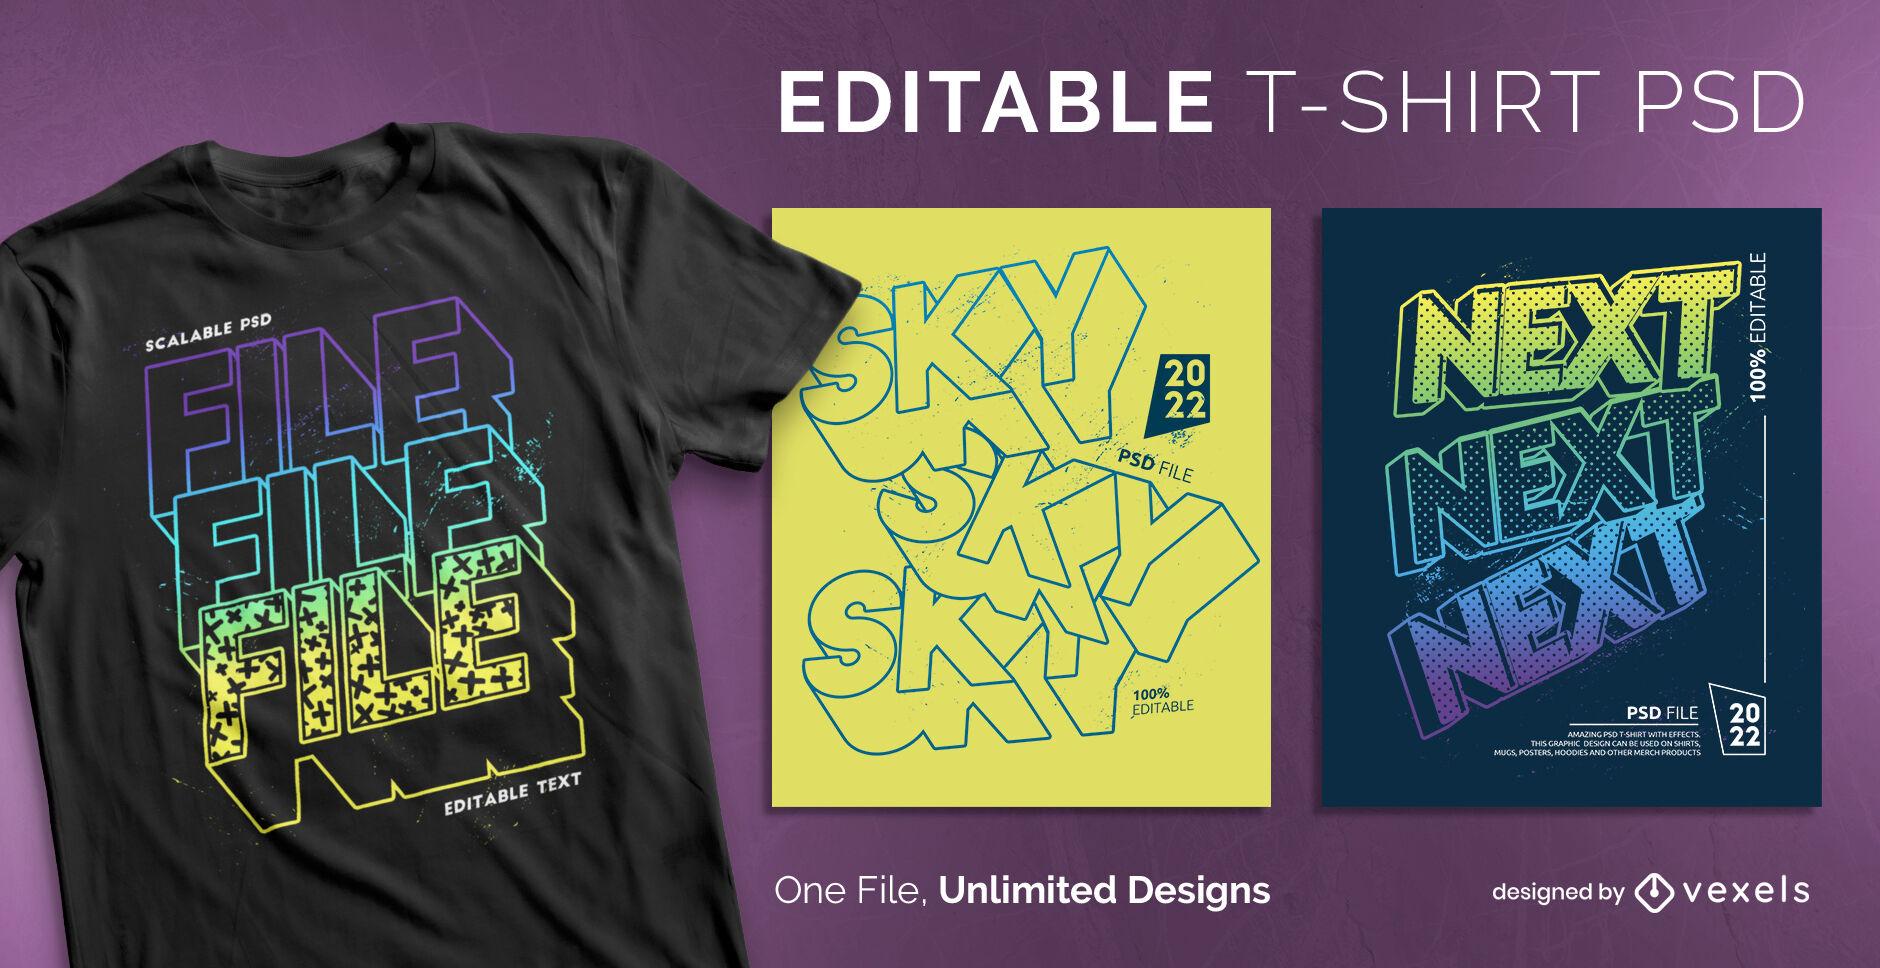 3D wiederholte Texteffekt-PSD-T-Shirt-Vorlage